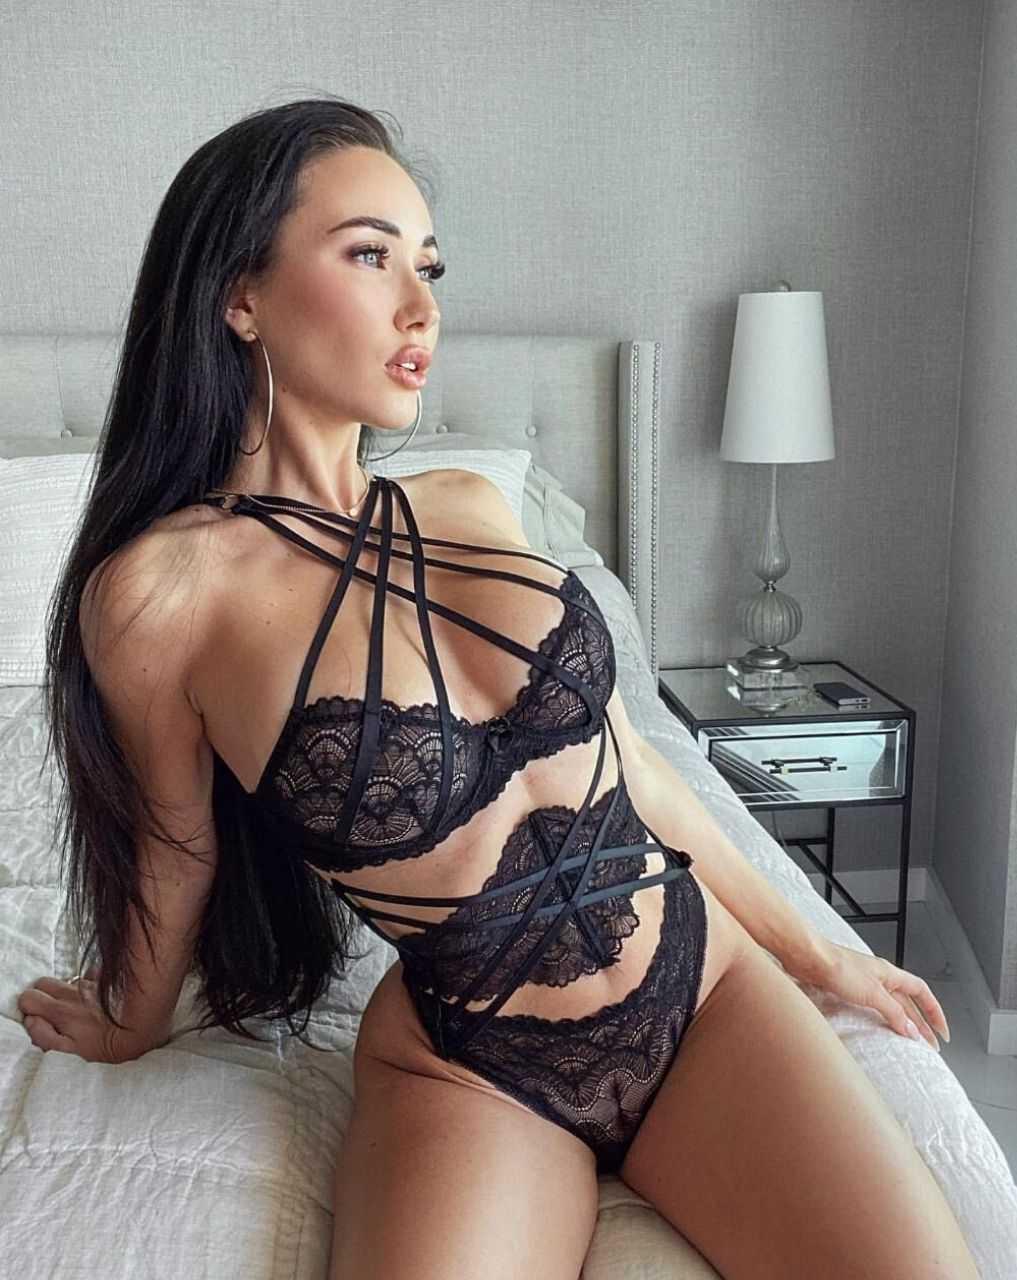 Вера эскорт модель - imgmodels.ru